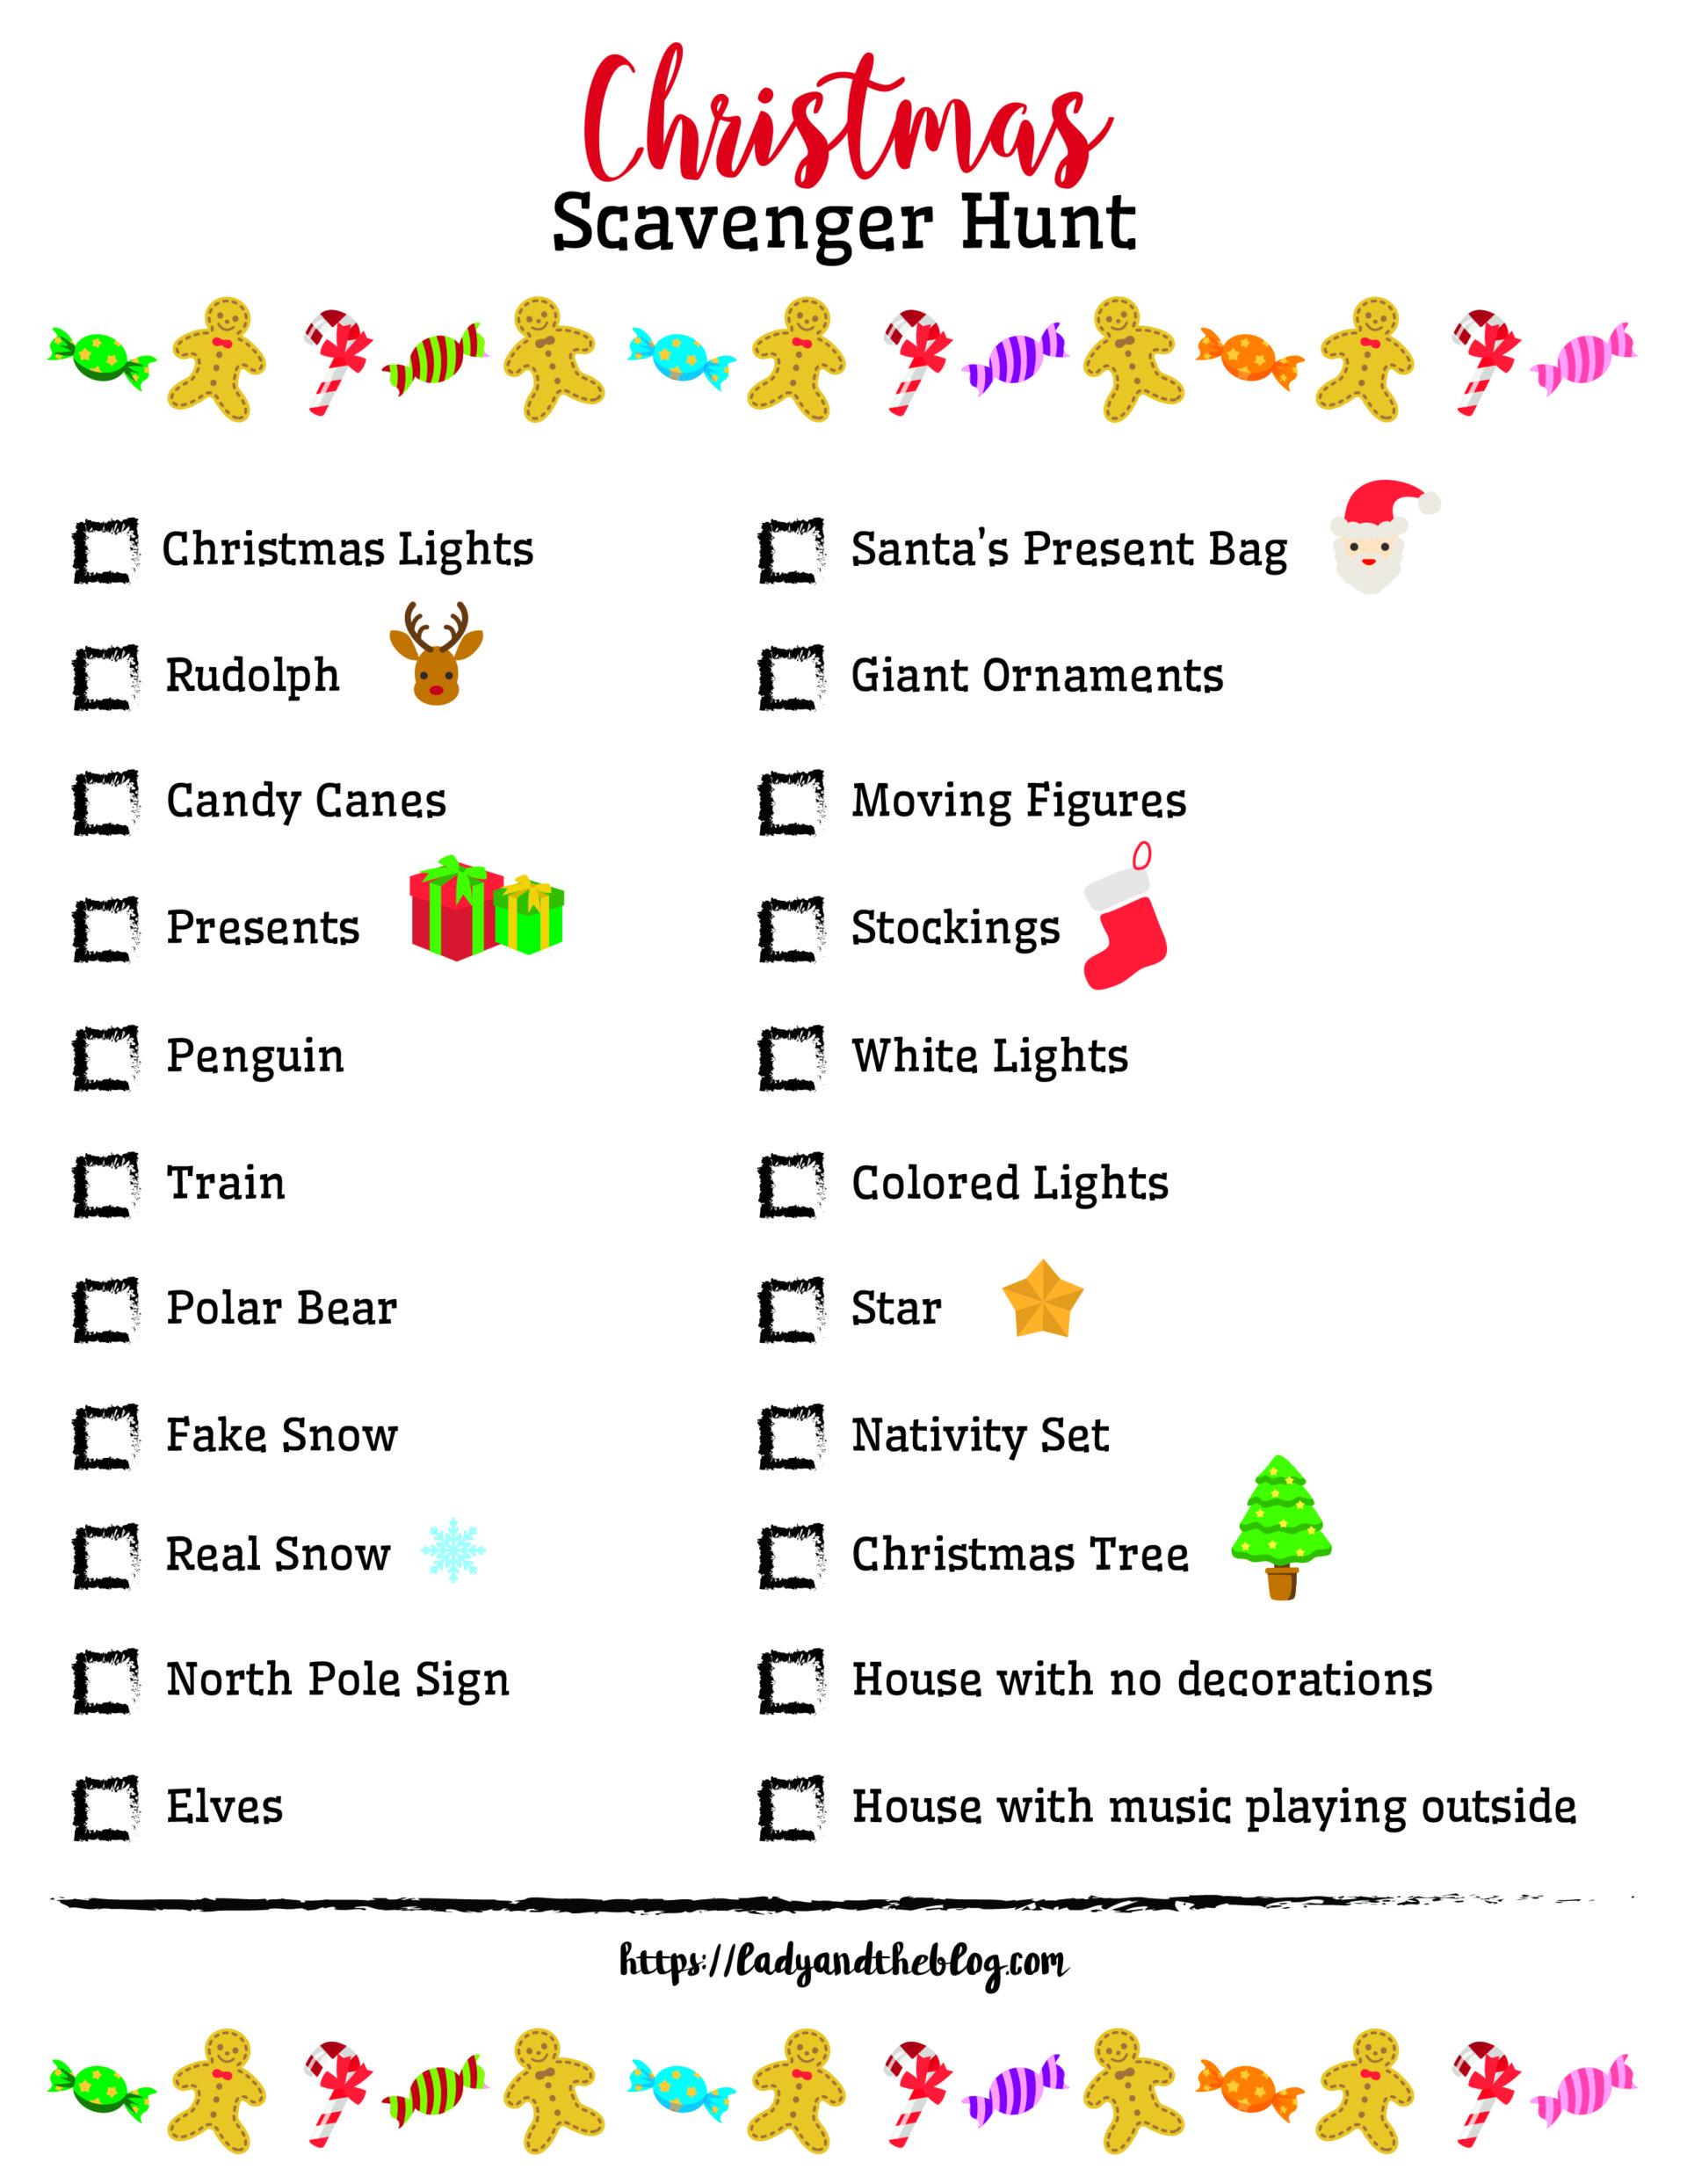 Christmas Scavenger Hunt Ideas - Free Printables For The Holiday - Free Printable Scavenger Hunt